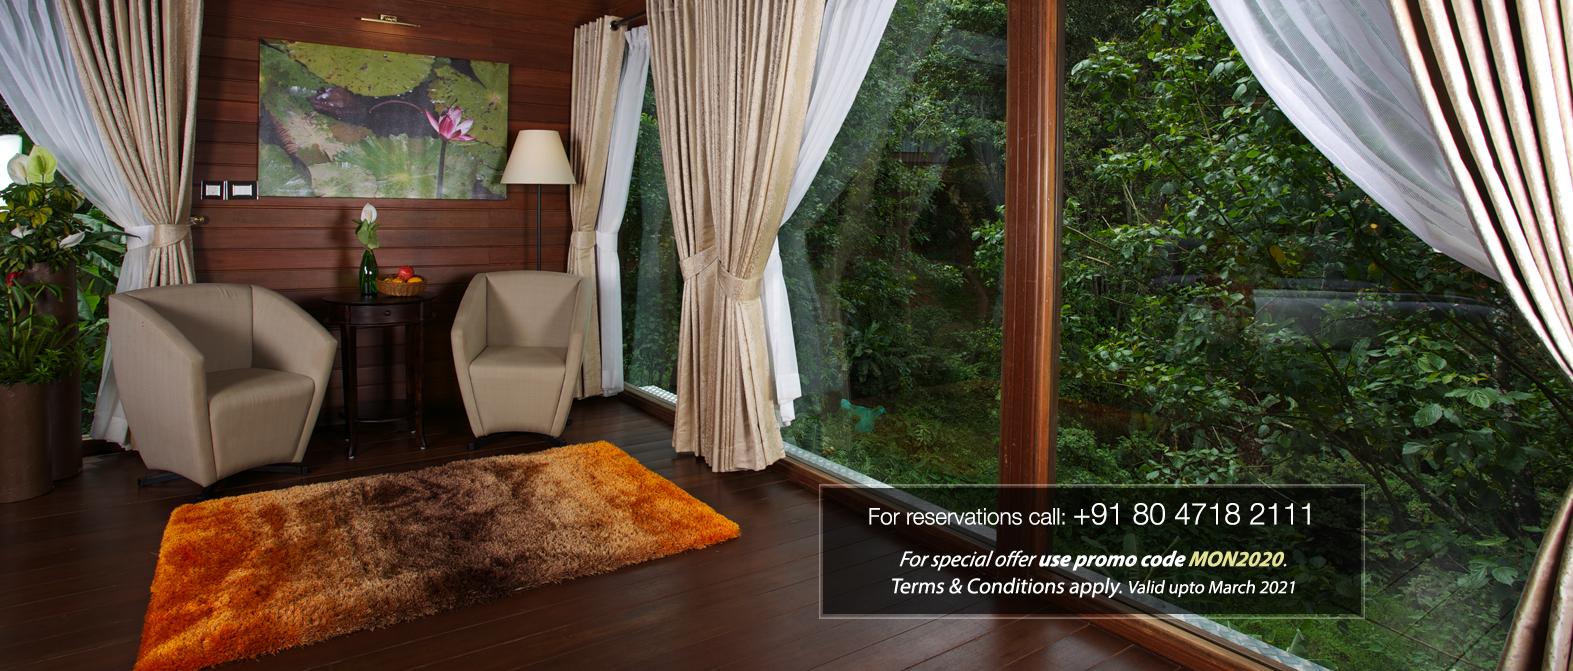 the best resort in coorg